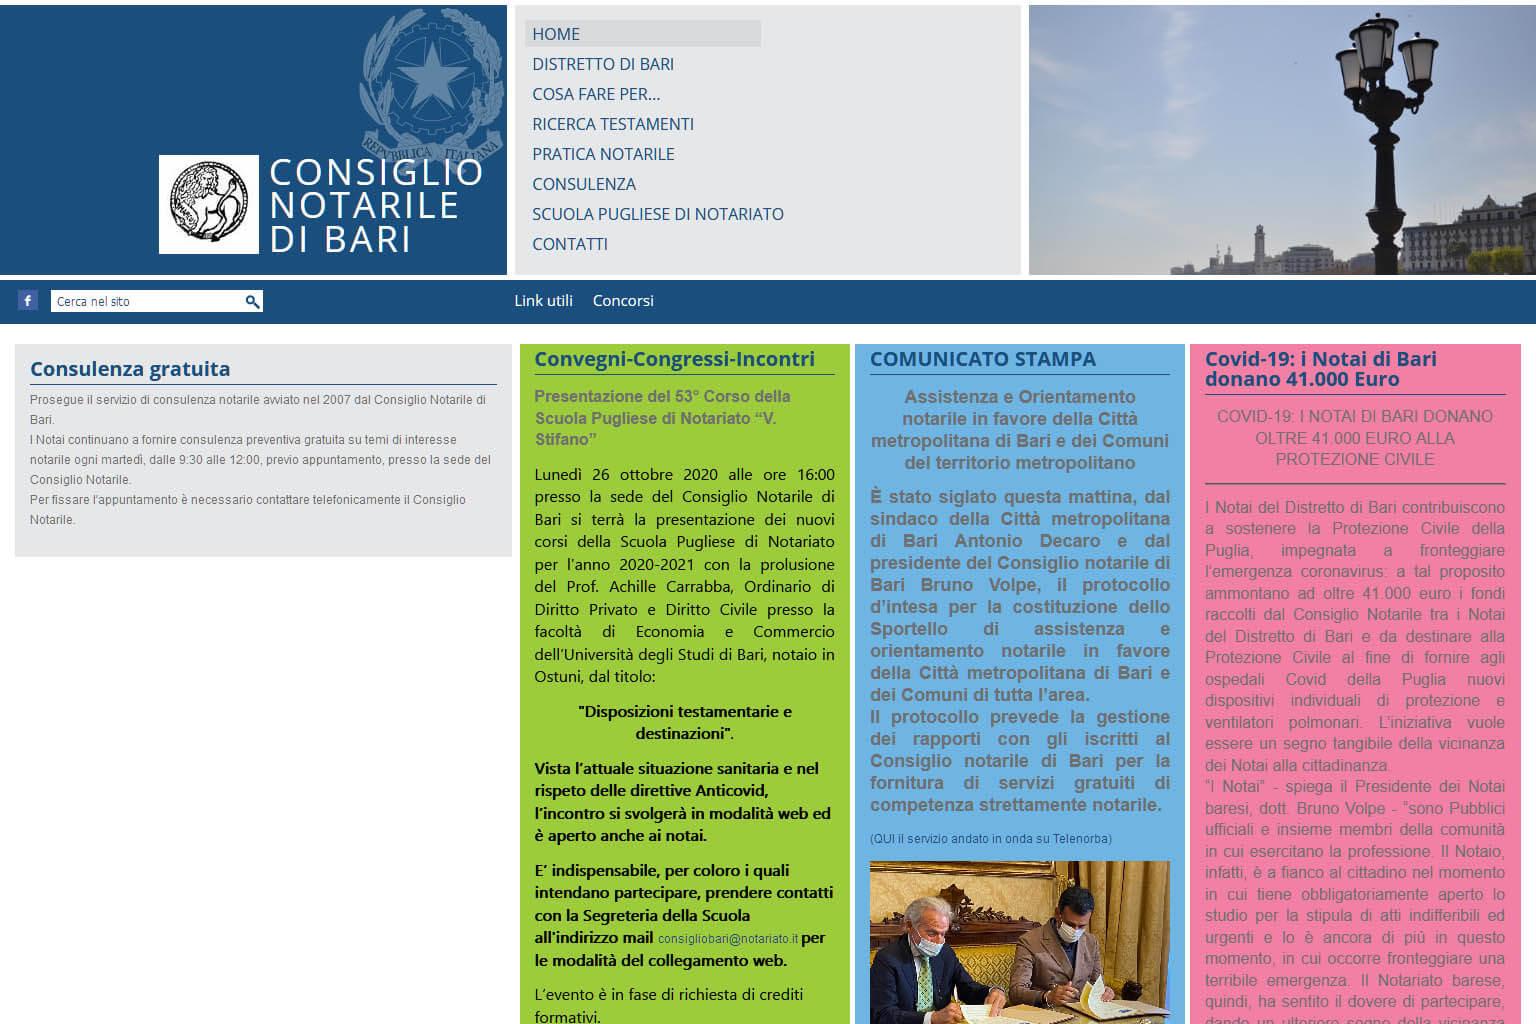 NotaioMyWeb | Consiglio Notarile Bari